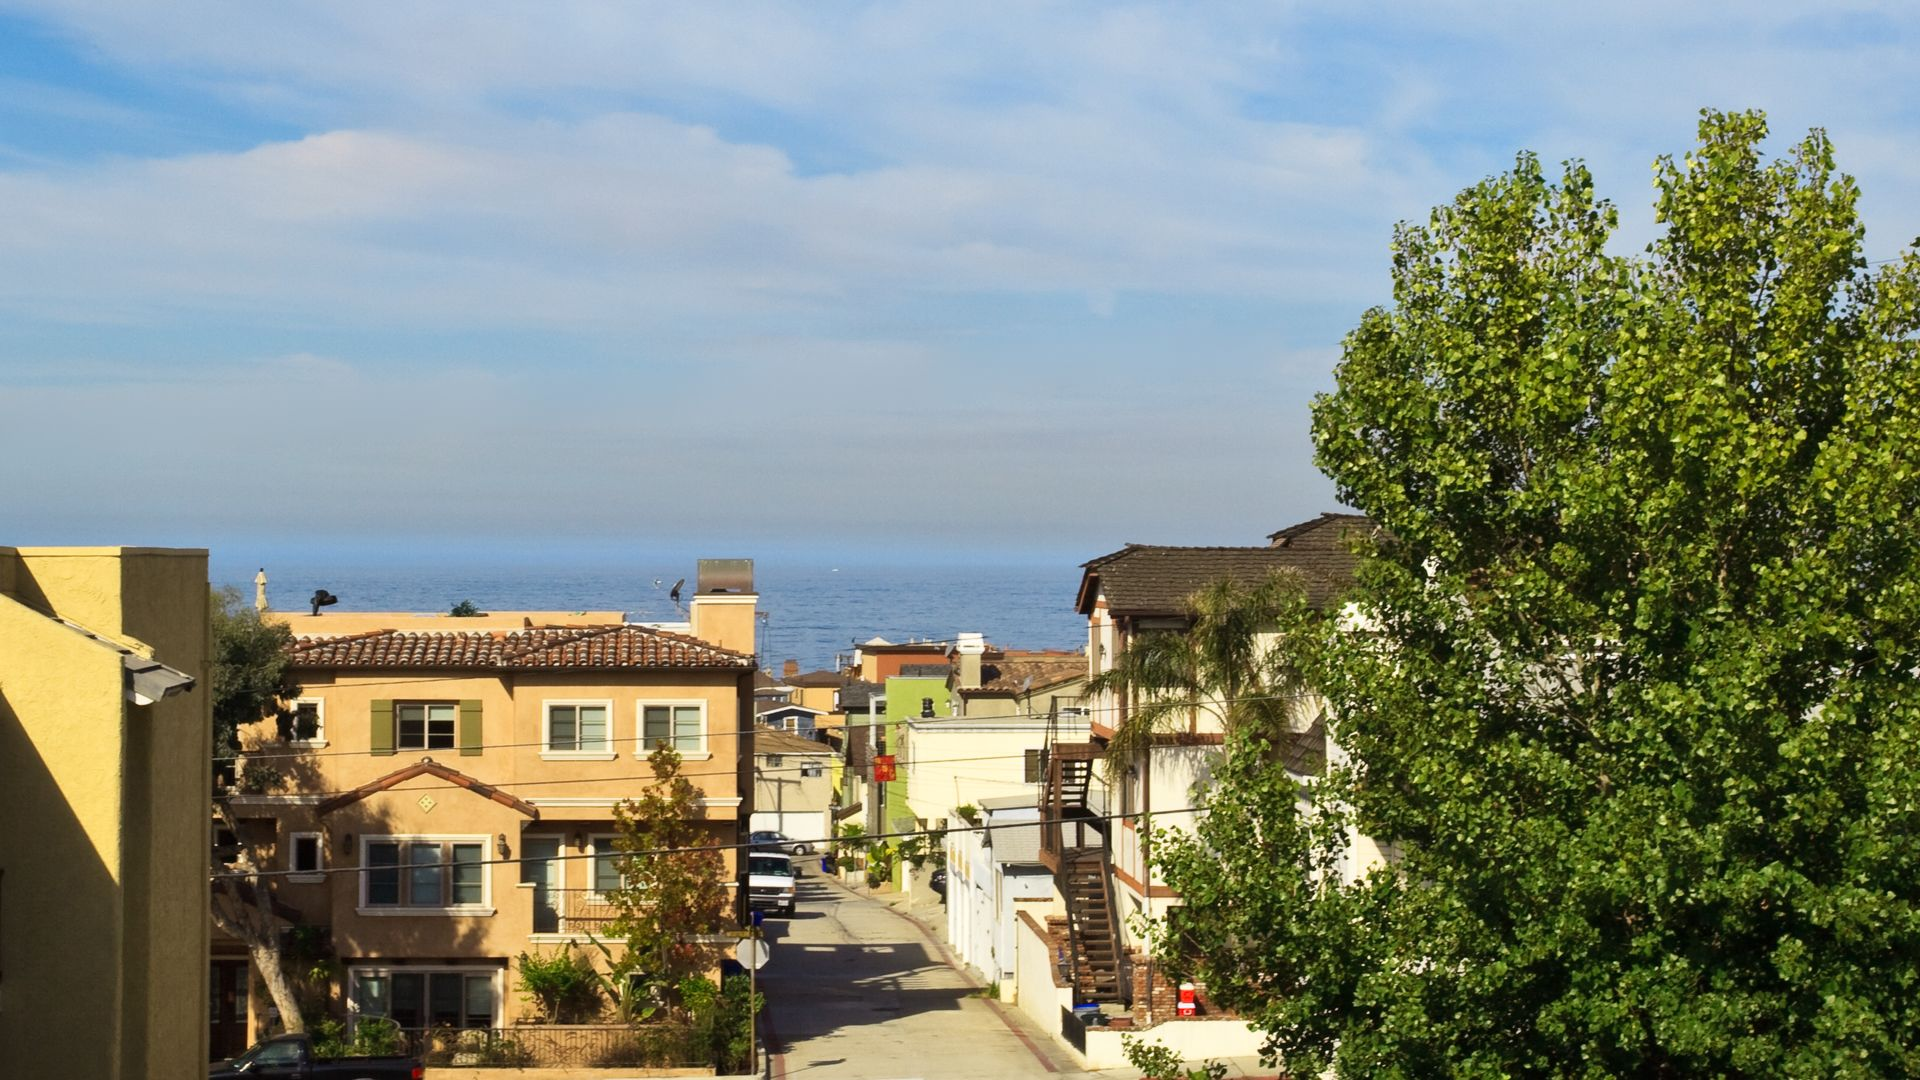 Playa Pacifica Apartments - Views